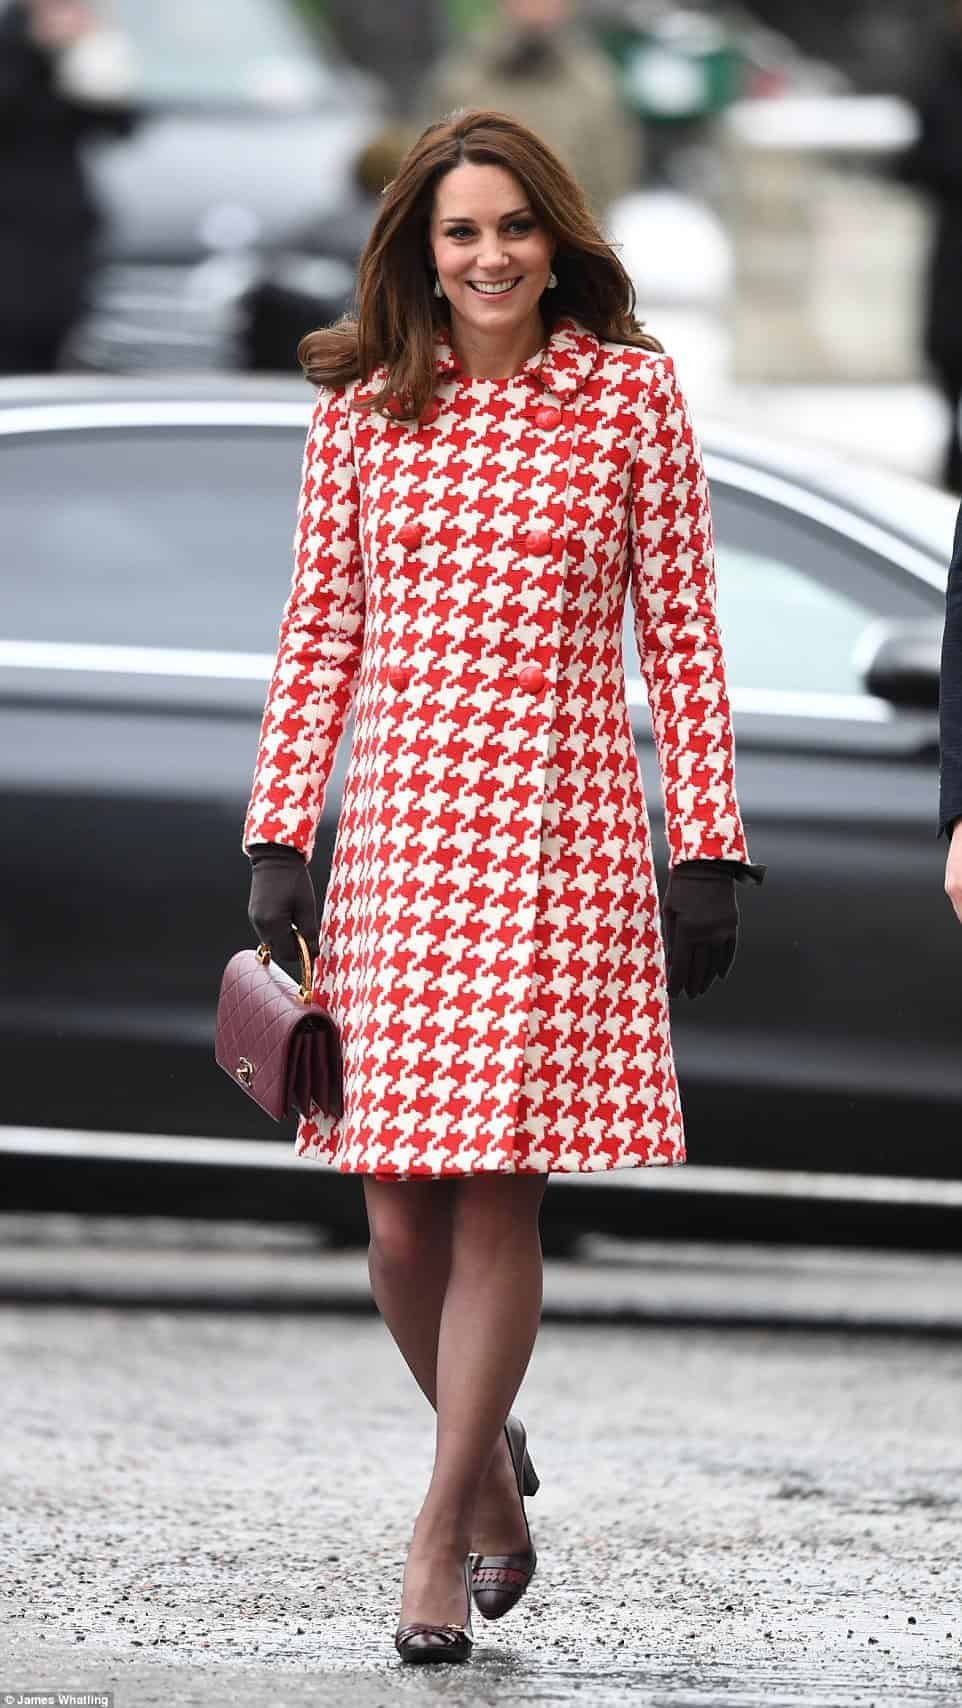 Esse foi o look que a duquesa Kate Middleton usou durante a visita a princesa da Suécia